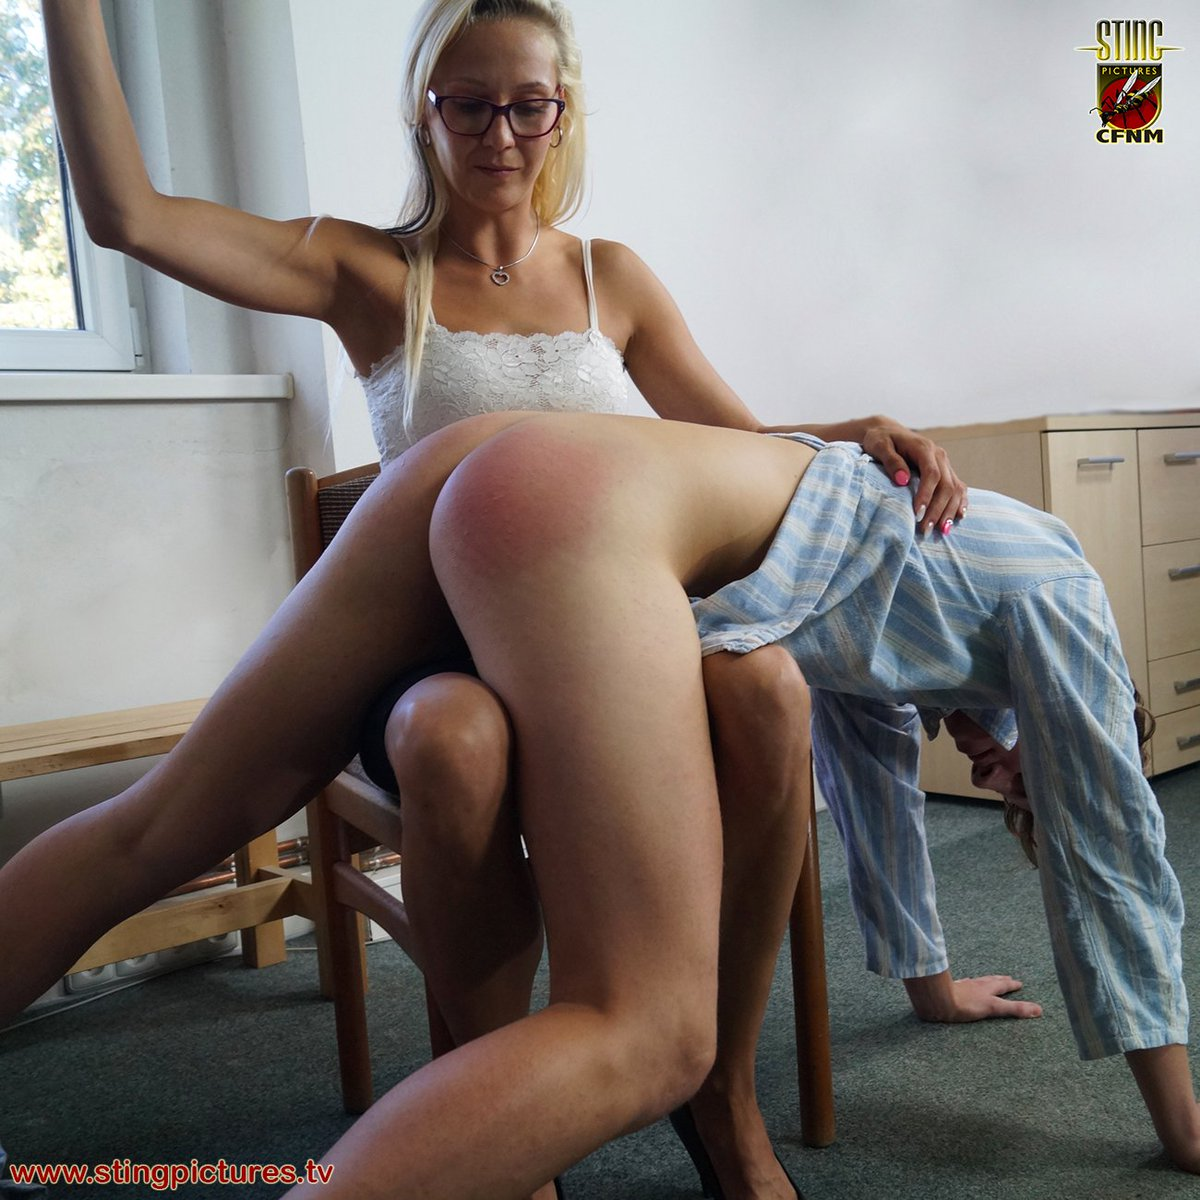 spanking cfnm femdom